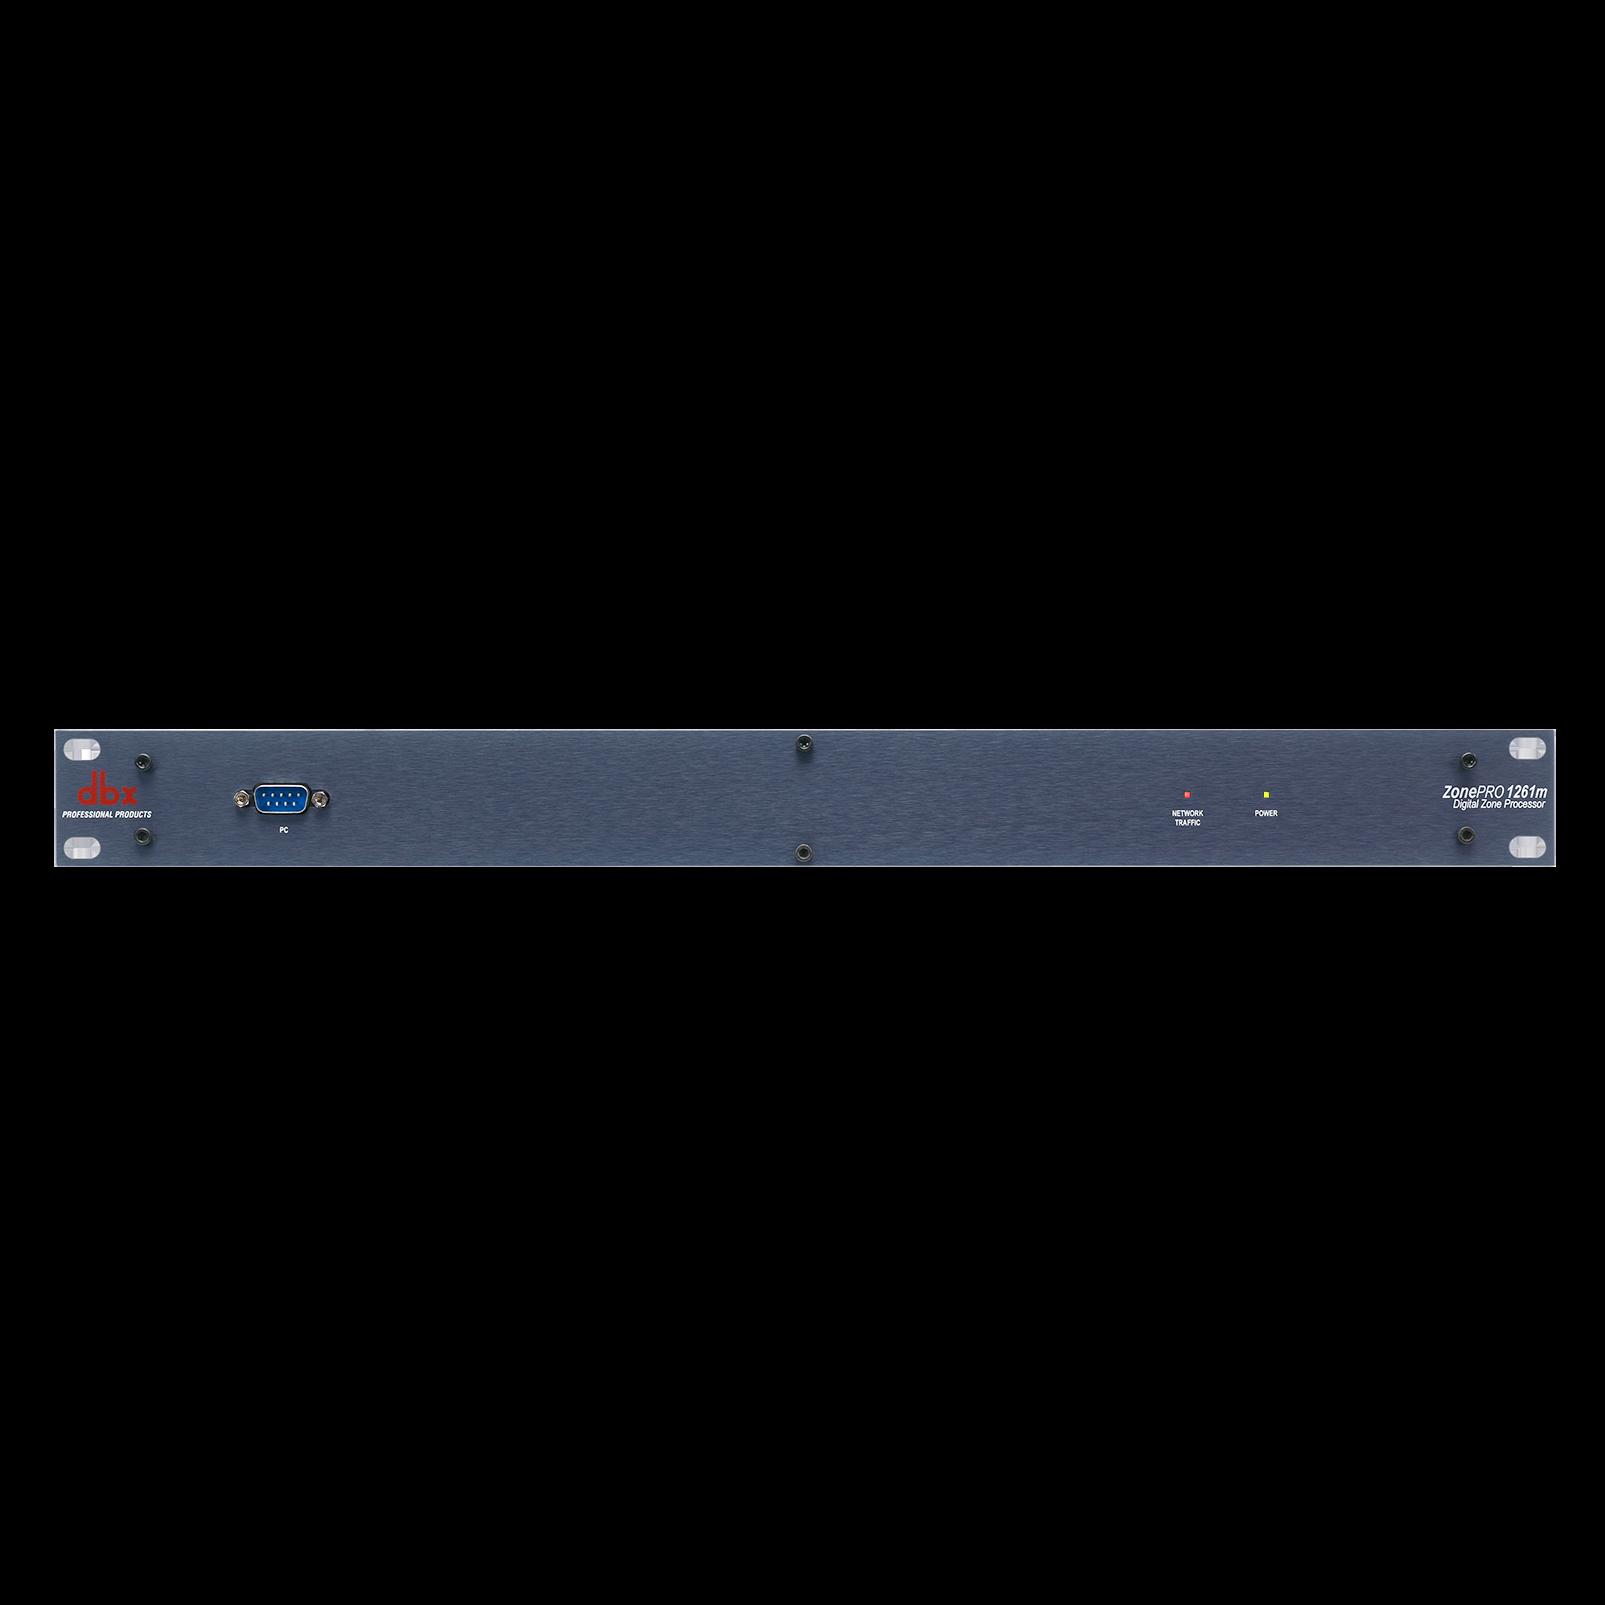 ZonePro 1261m - Black - 12x6 Digital Zone Processor - Hero